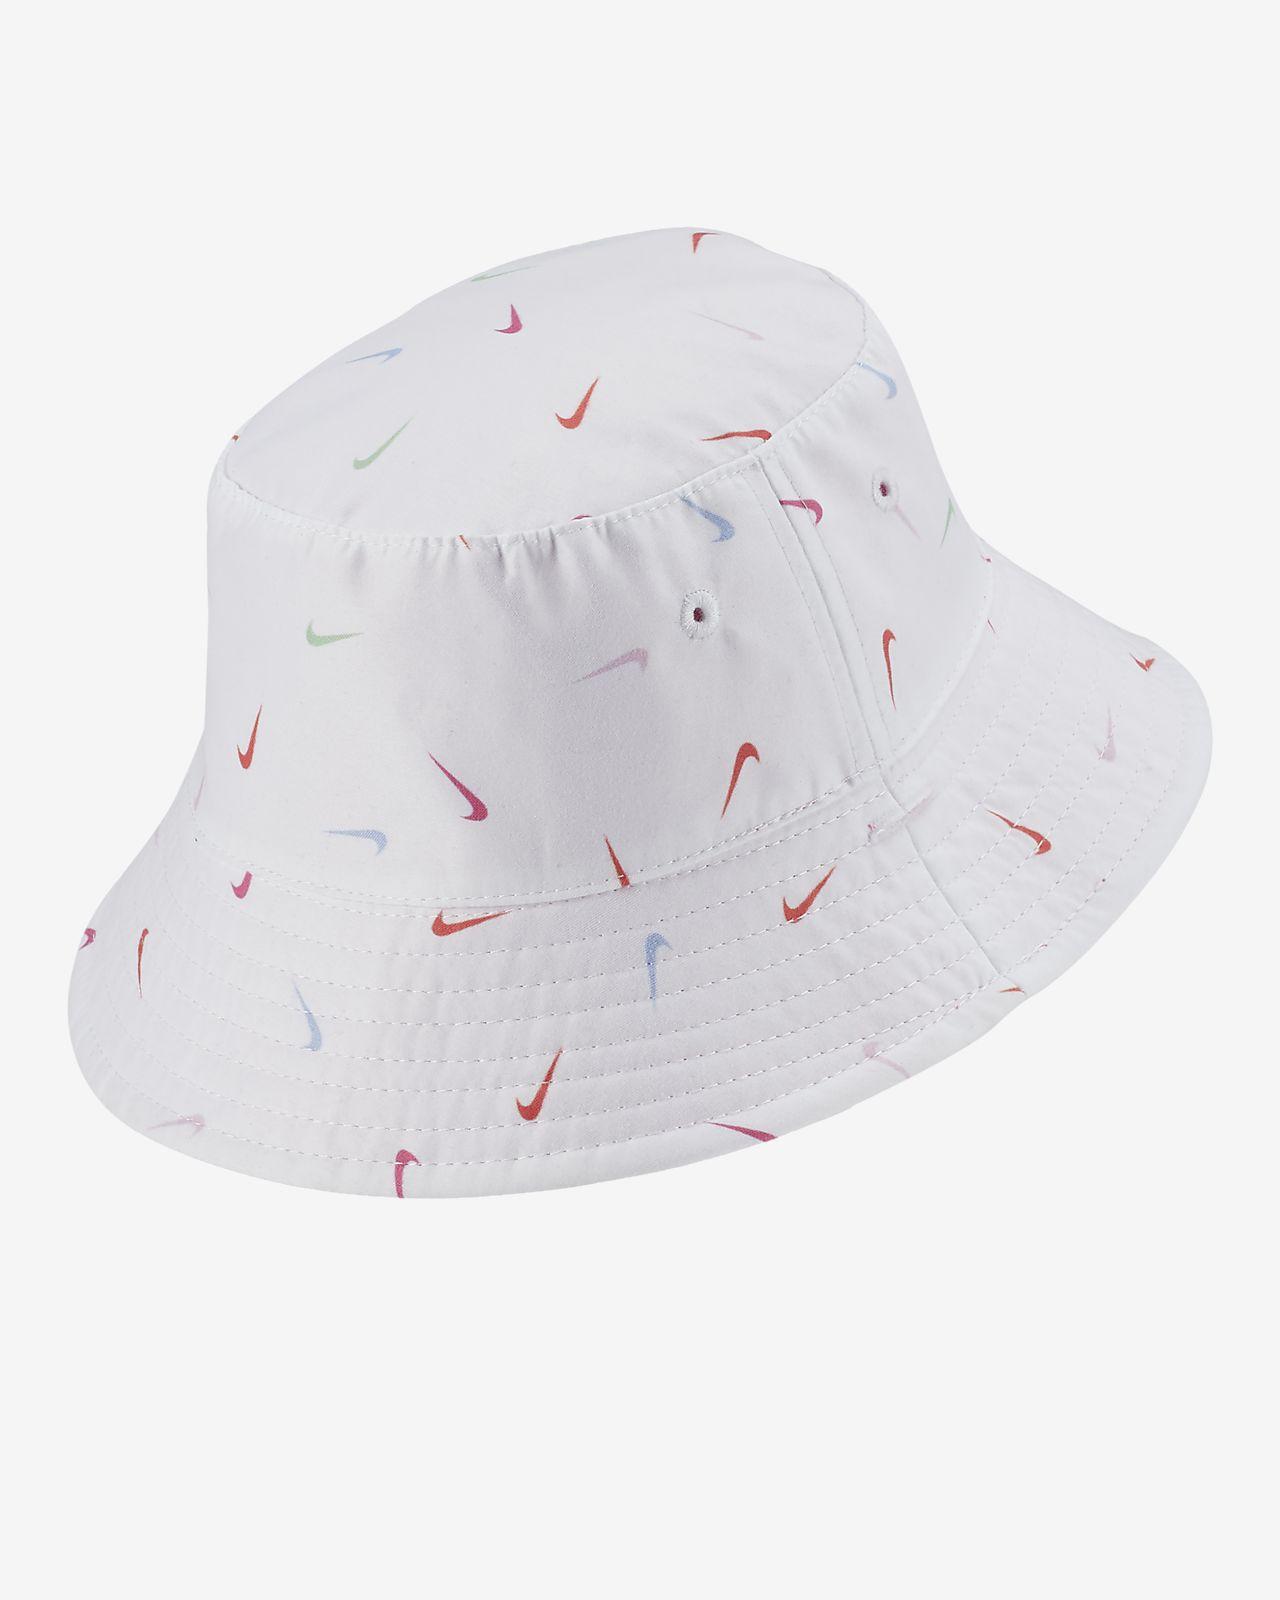 15181969 Nike Dri-FIT Toddler Reversible Bucket Hat. Nike.com